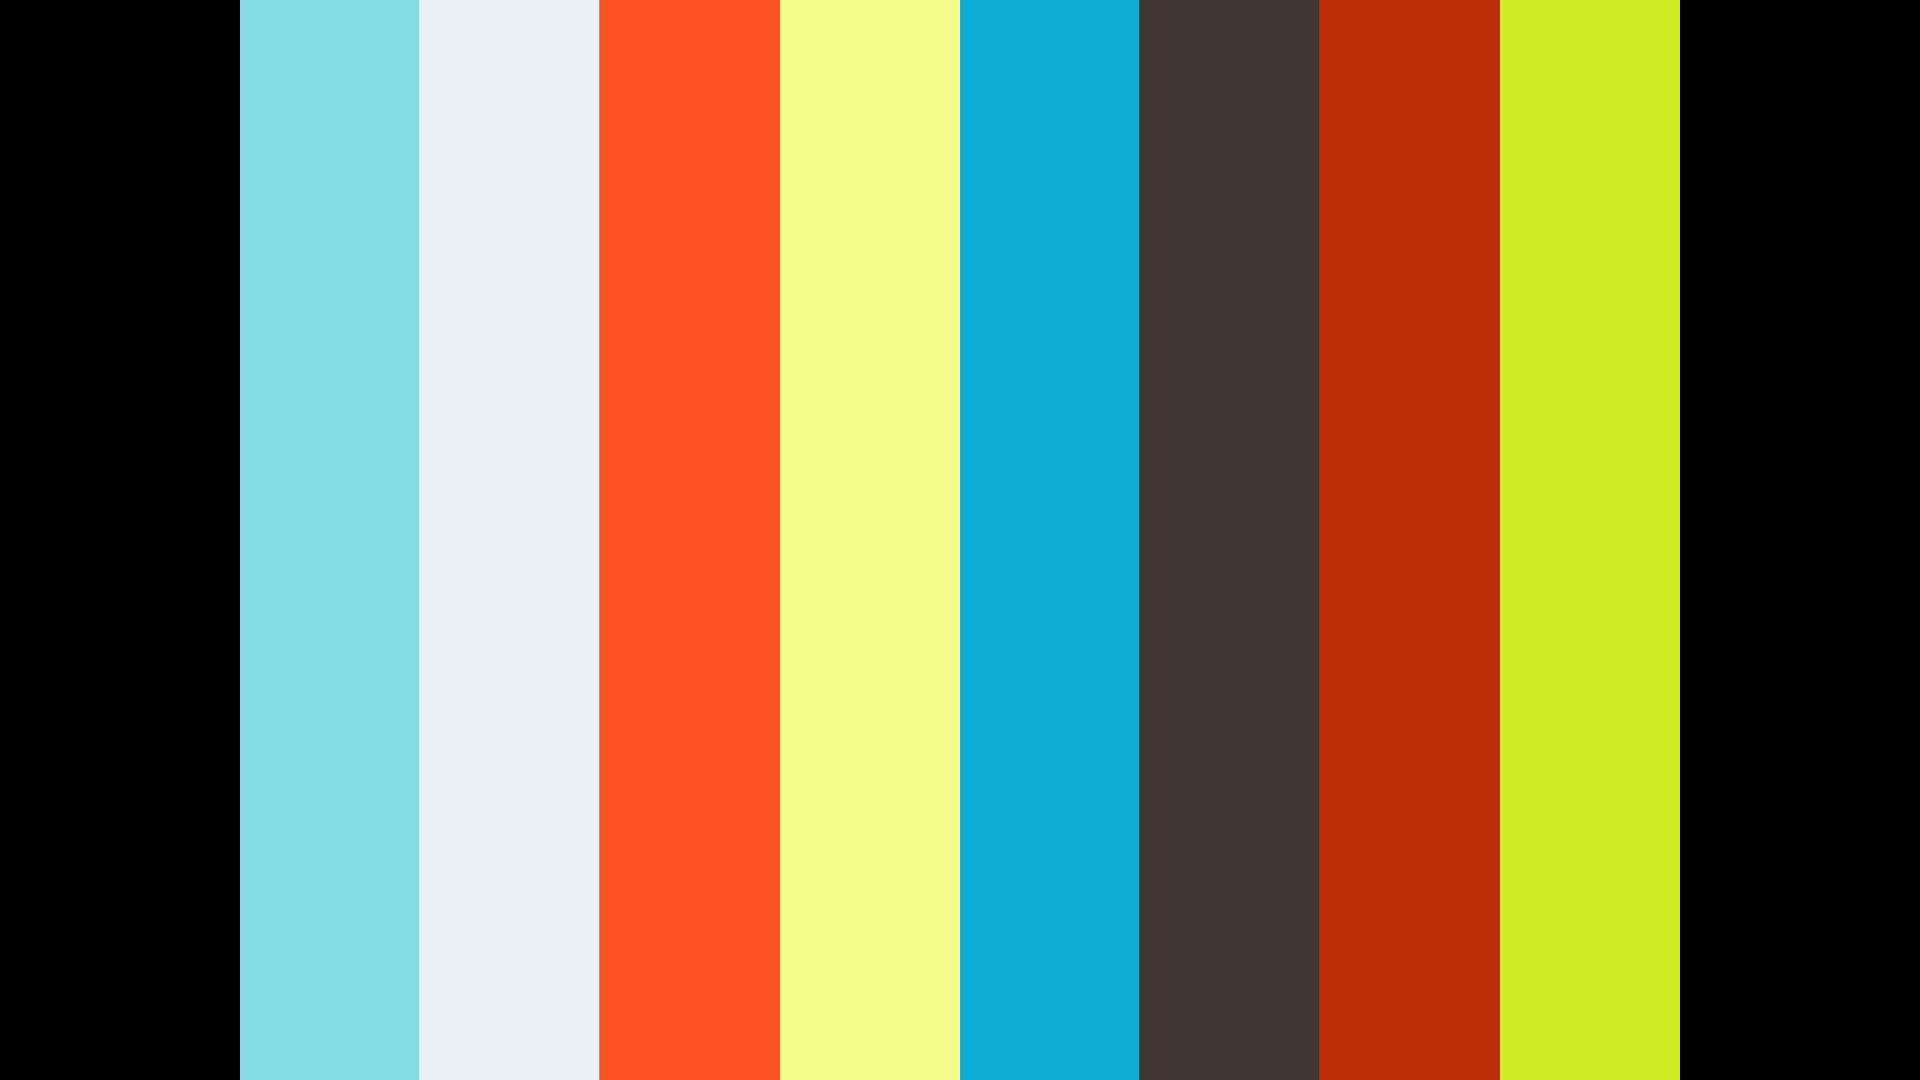 EP 272: Esper.io Launches Platform for Android Deployment & App Managment